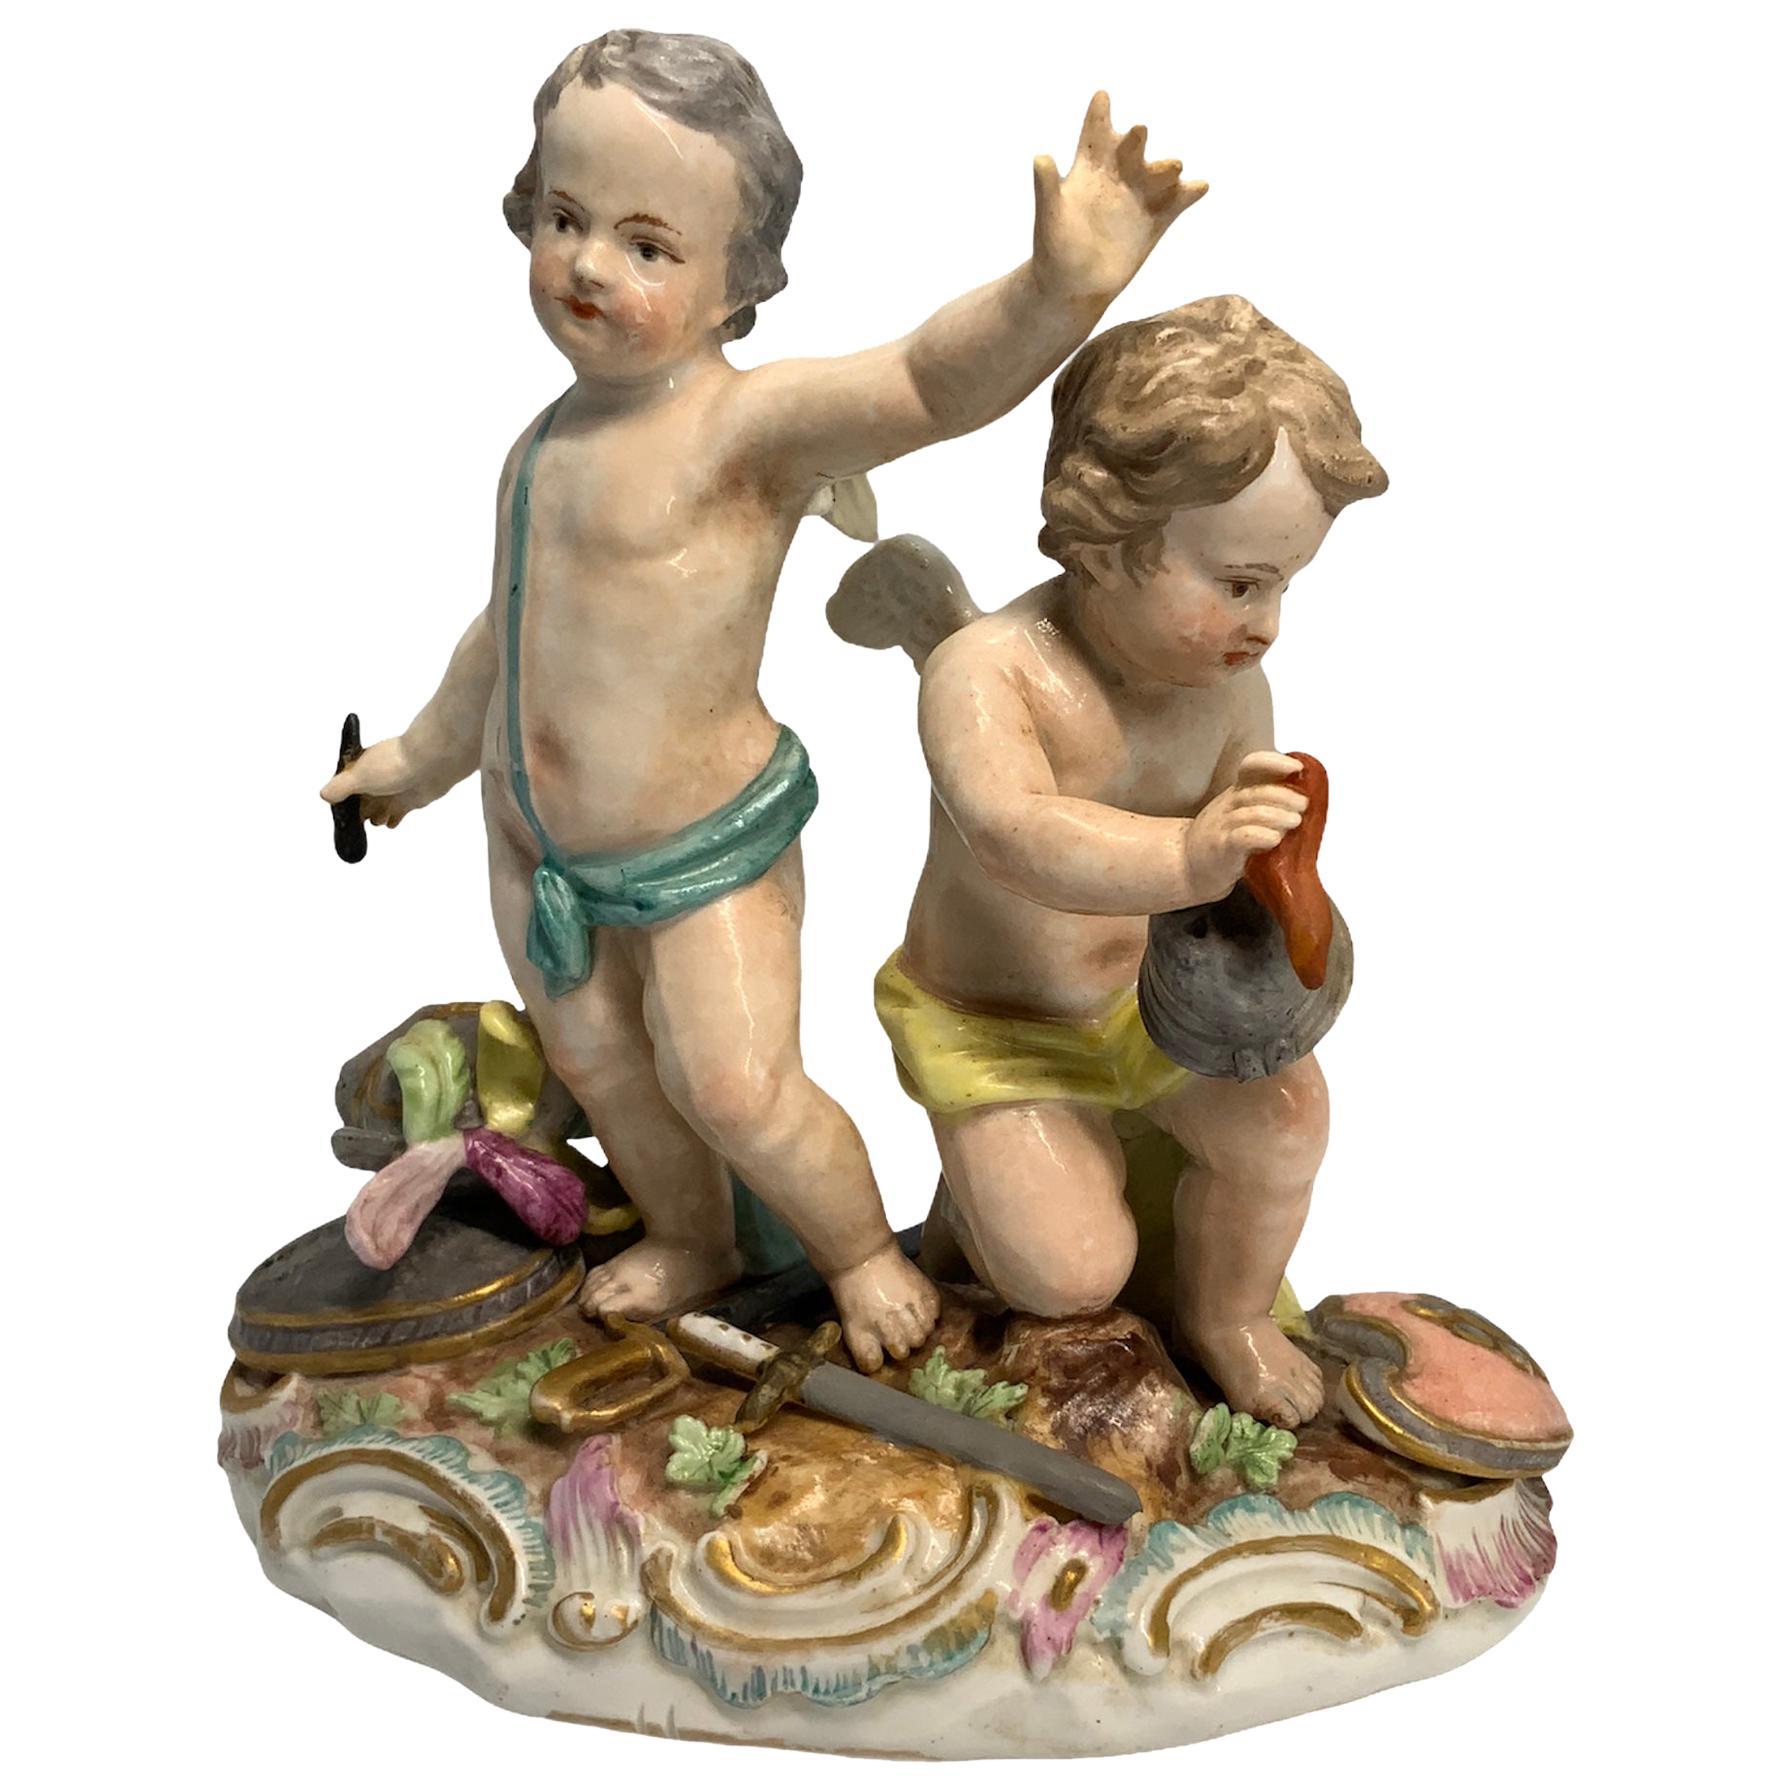 Royal Porcelain or State's Porcelain Manufactory 'KPM' Cherub's Sculpture